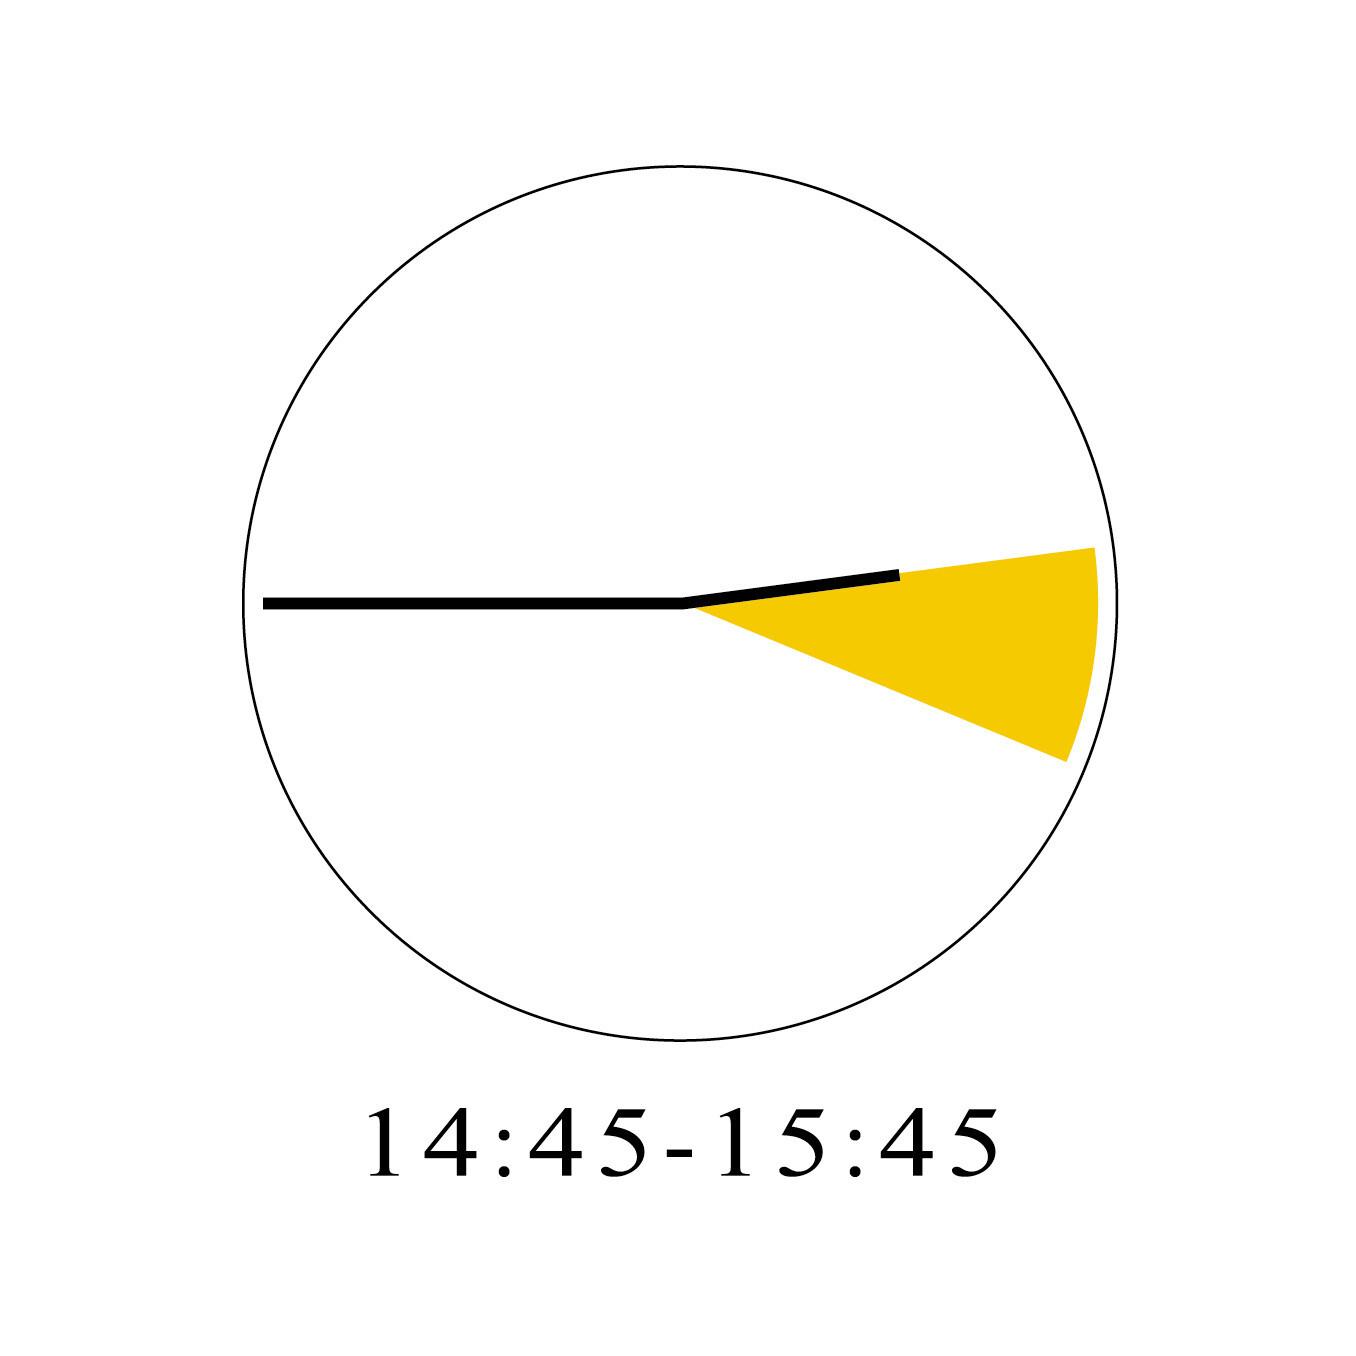 3/11 14:45-15:45